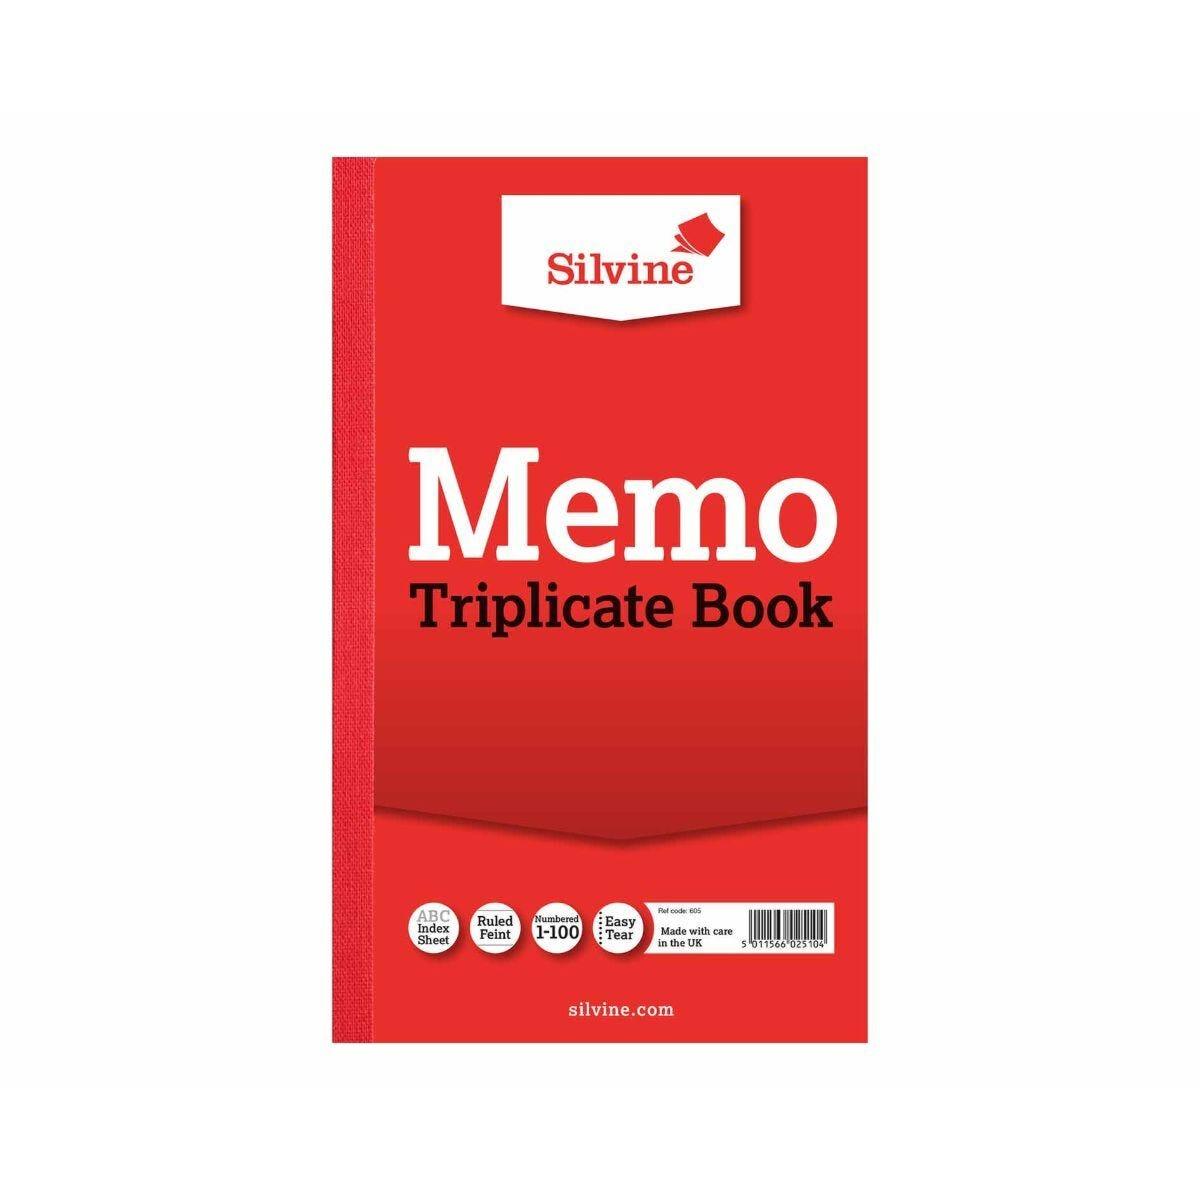 Silvine Triplicate Memo Book 605 Ruled and Perforated Feint 100 Sheets